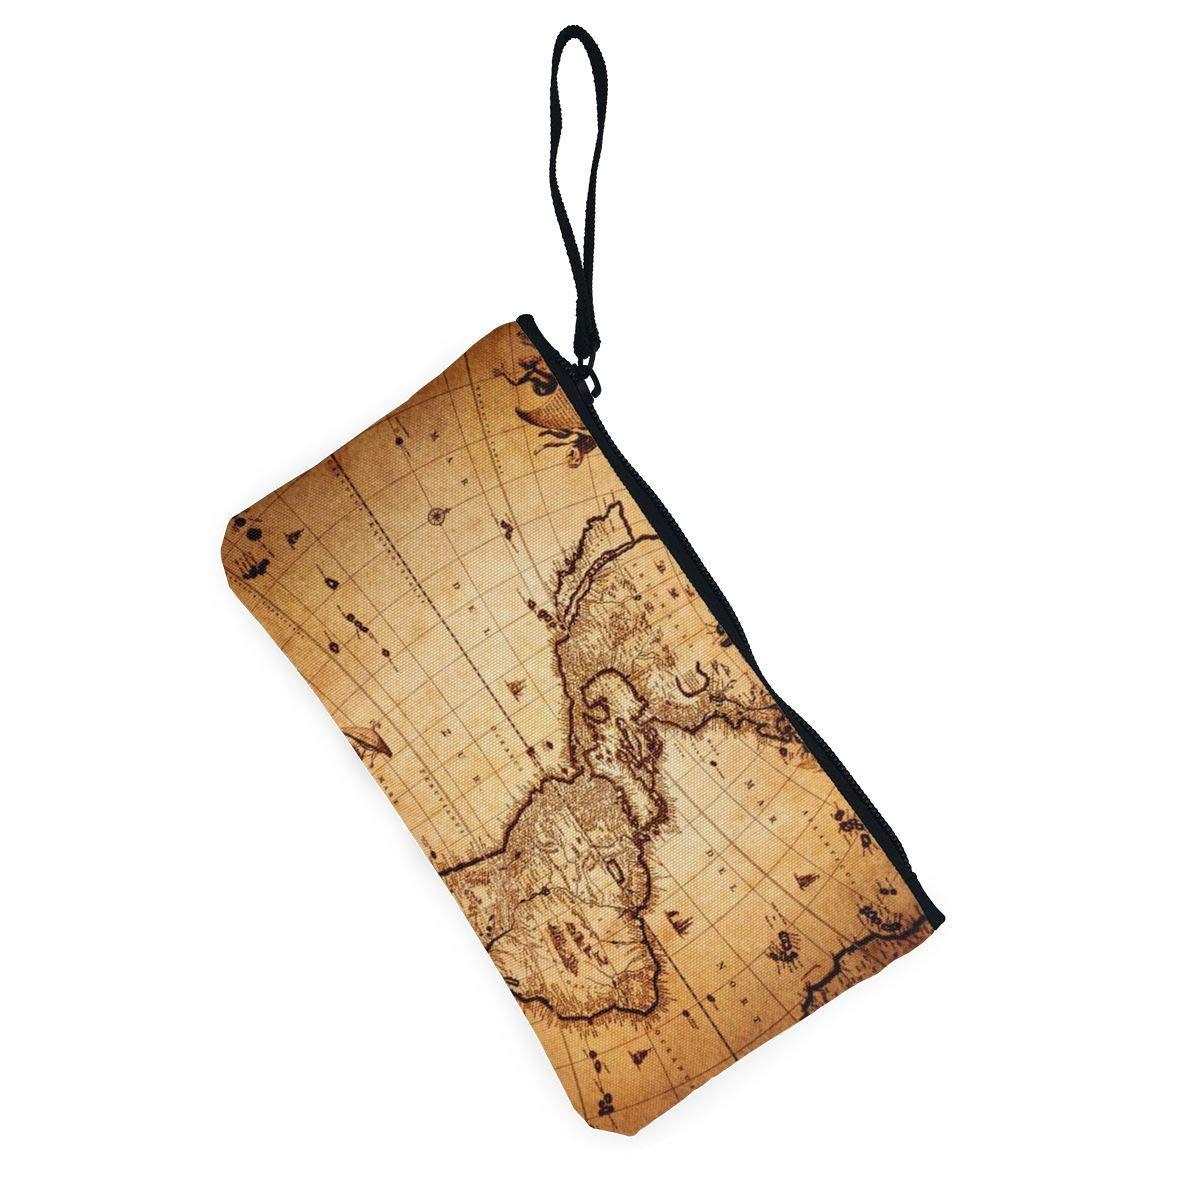 YUANSHAN Retro World Map Unisex Canvas Coin Purse Change Cash Bag Zipper Small Purse Wallets with Handle